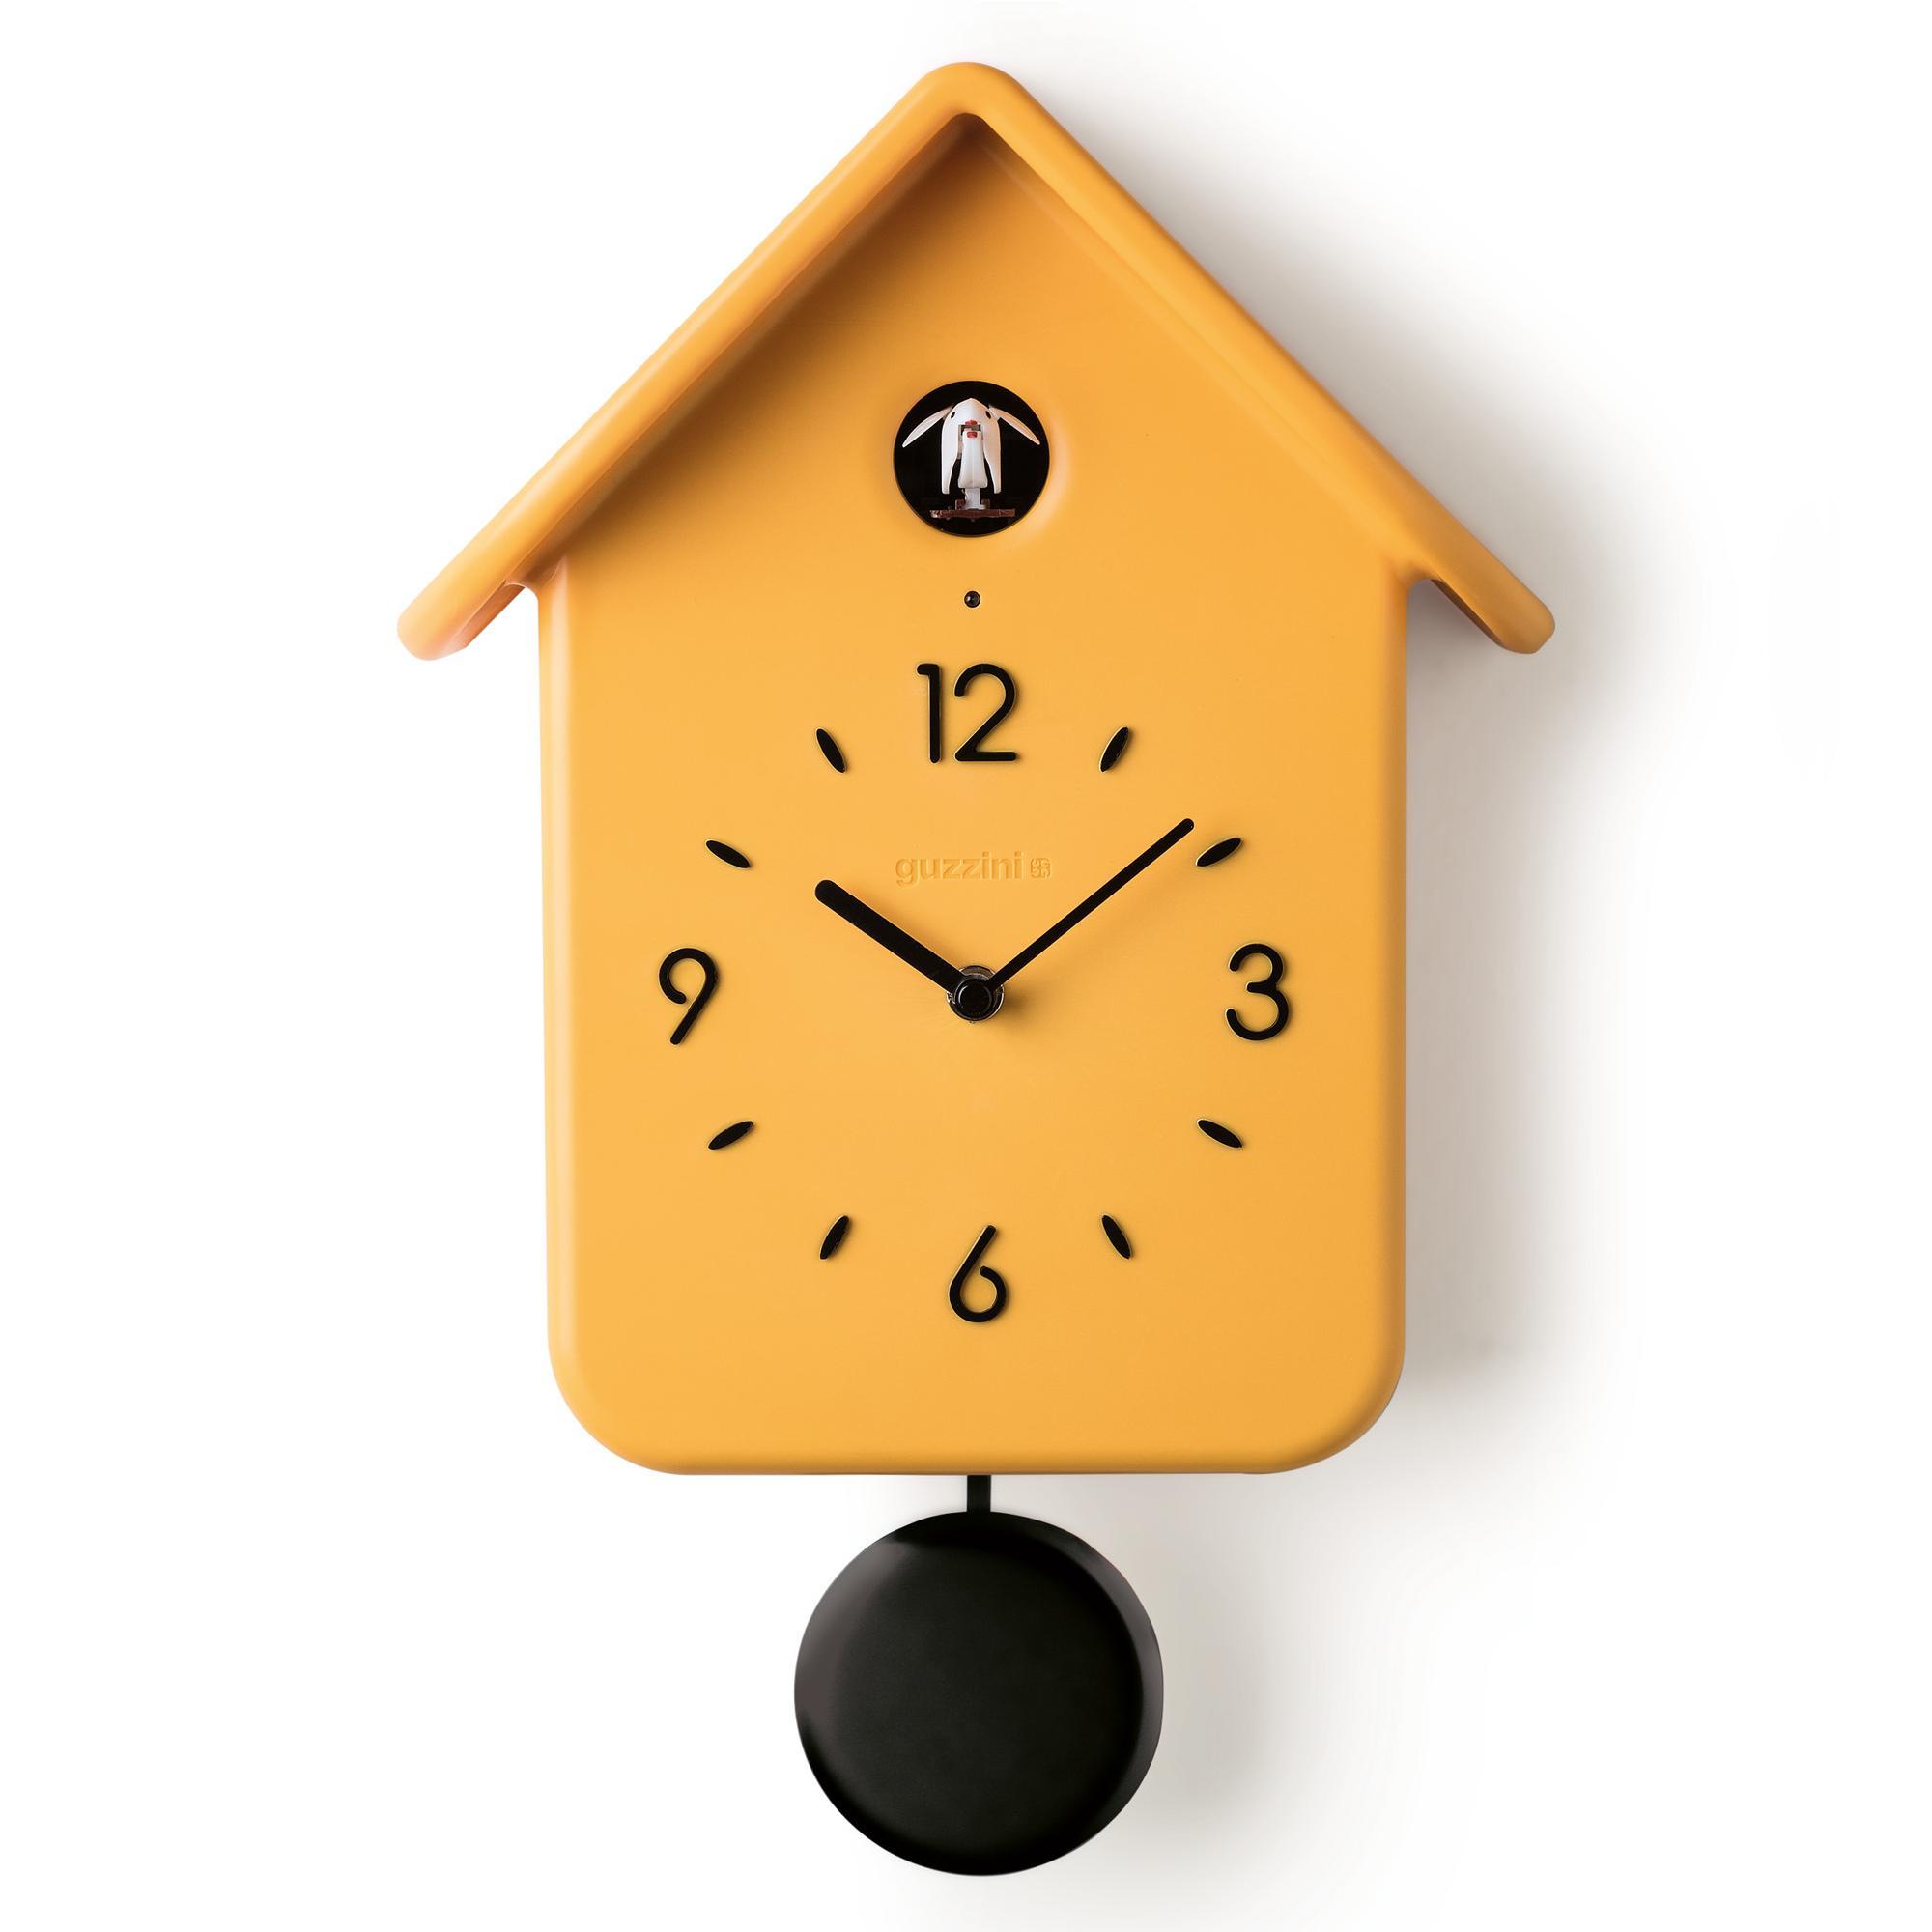 Awesome orologi da cucina guzzini images ideas design - Orologio cucu design ...